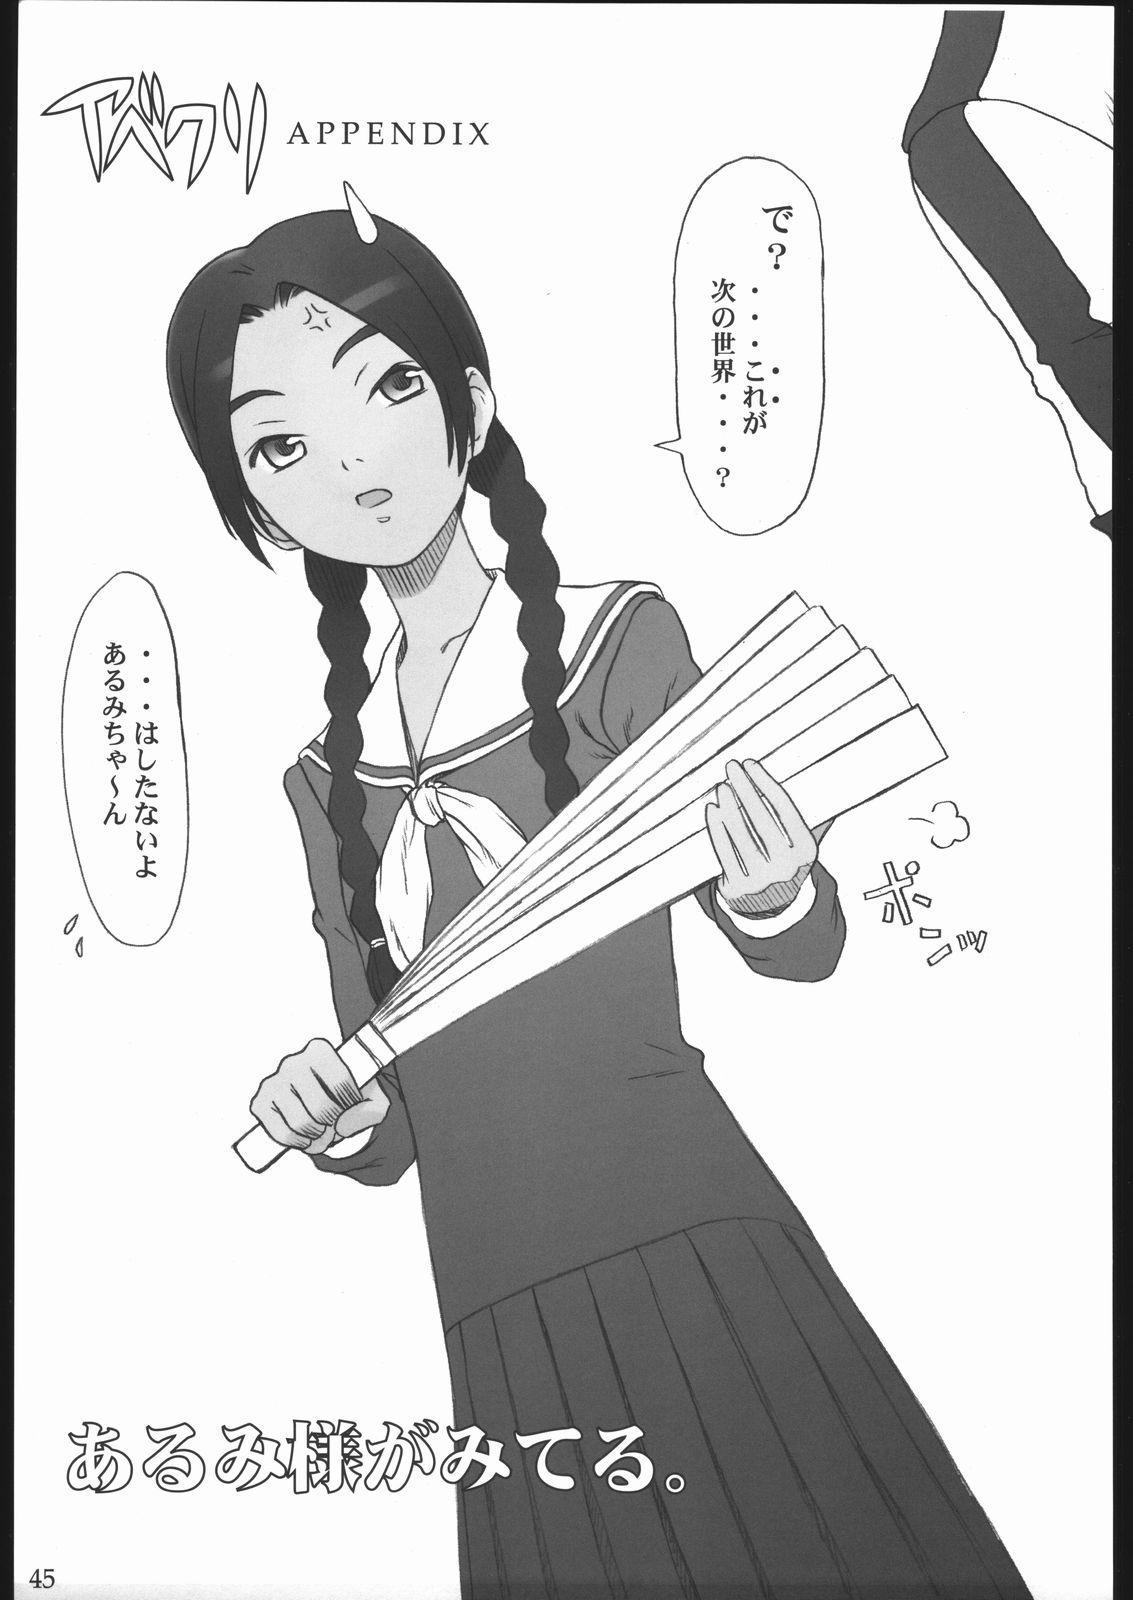 SACRIFICE Tsuji Takeshi Works Selection vol. 2 42